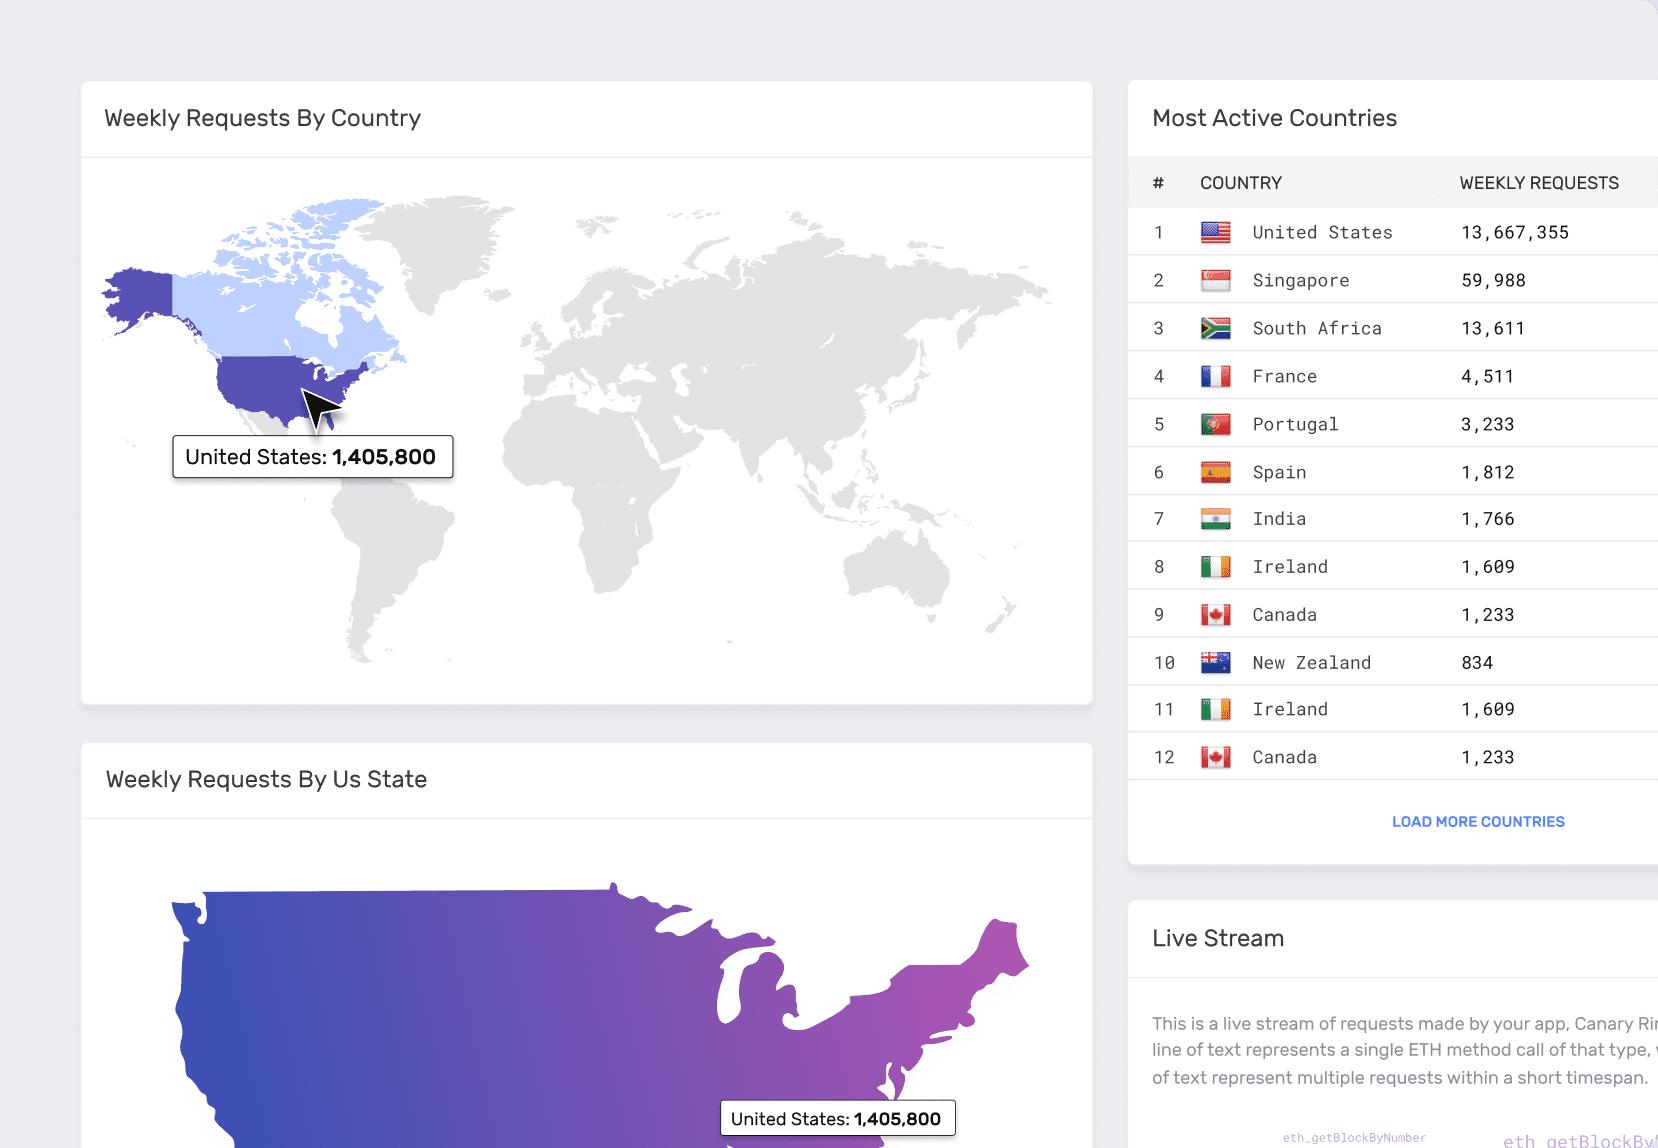 User insights